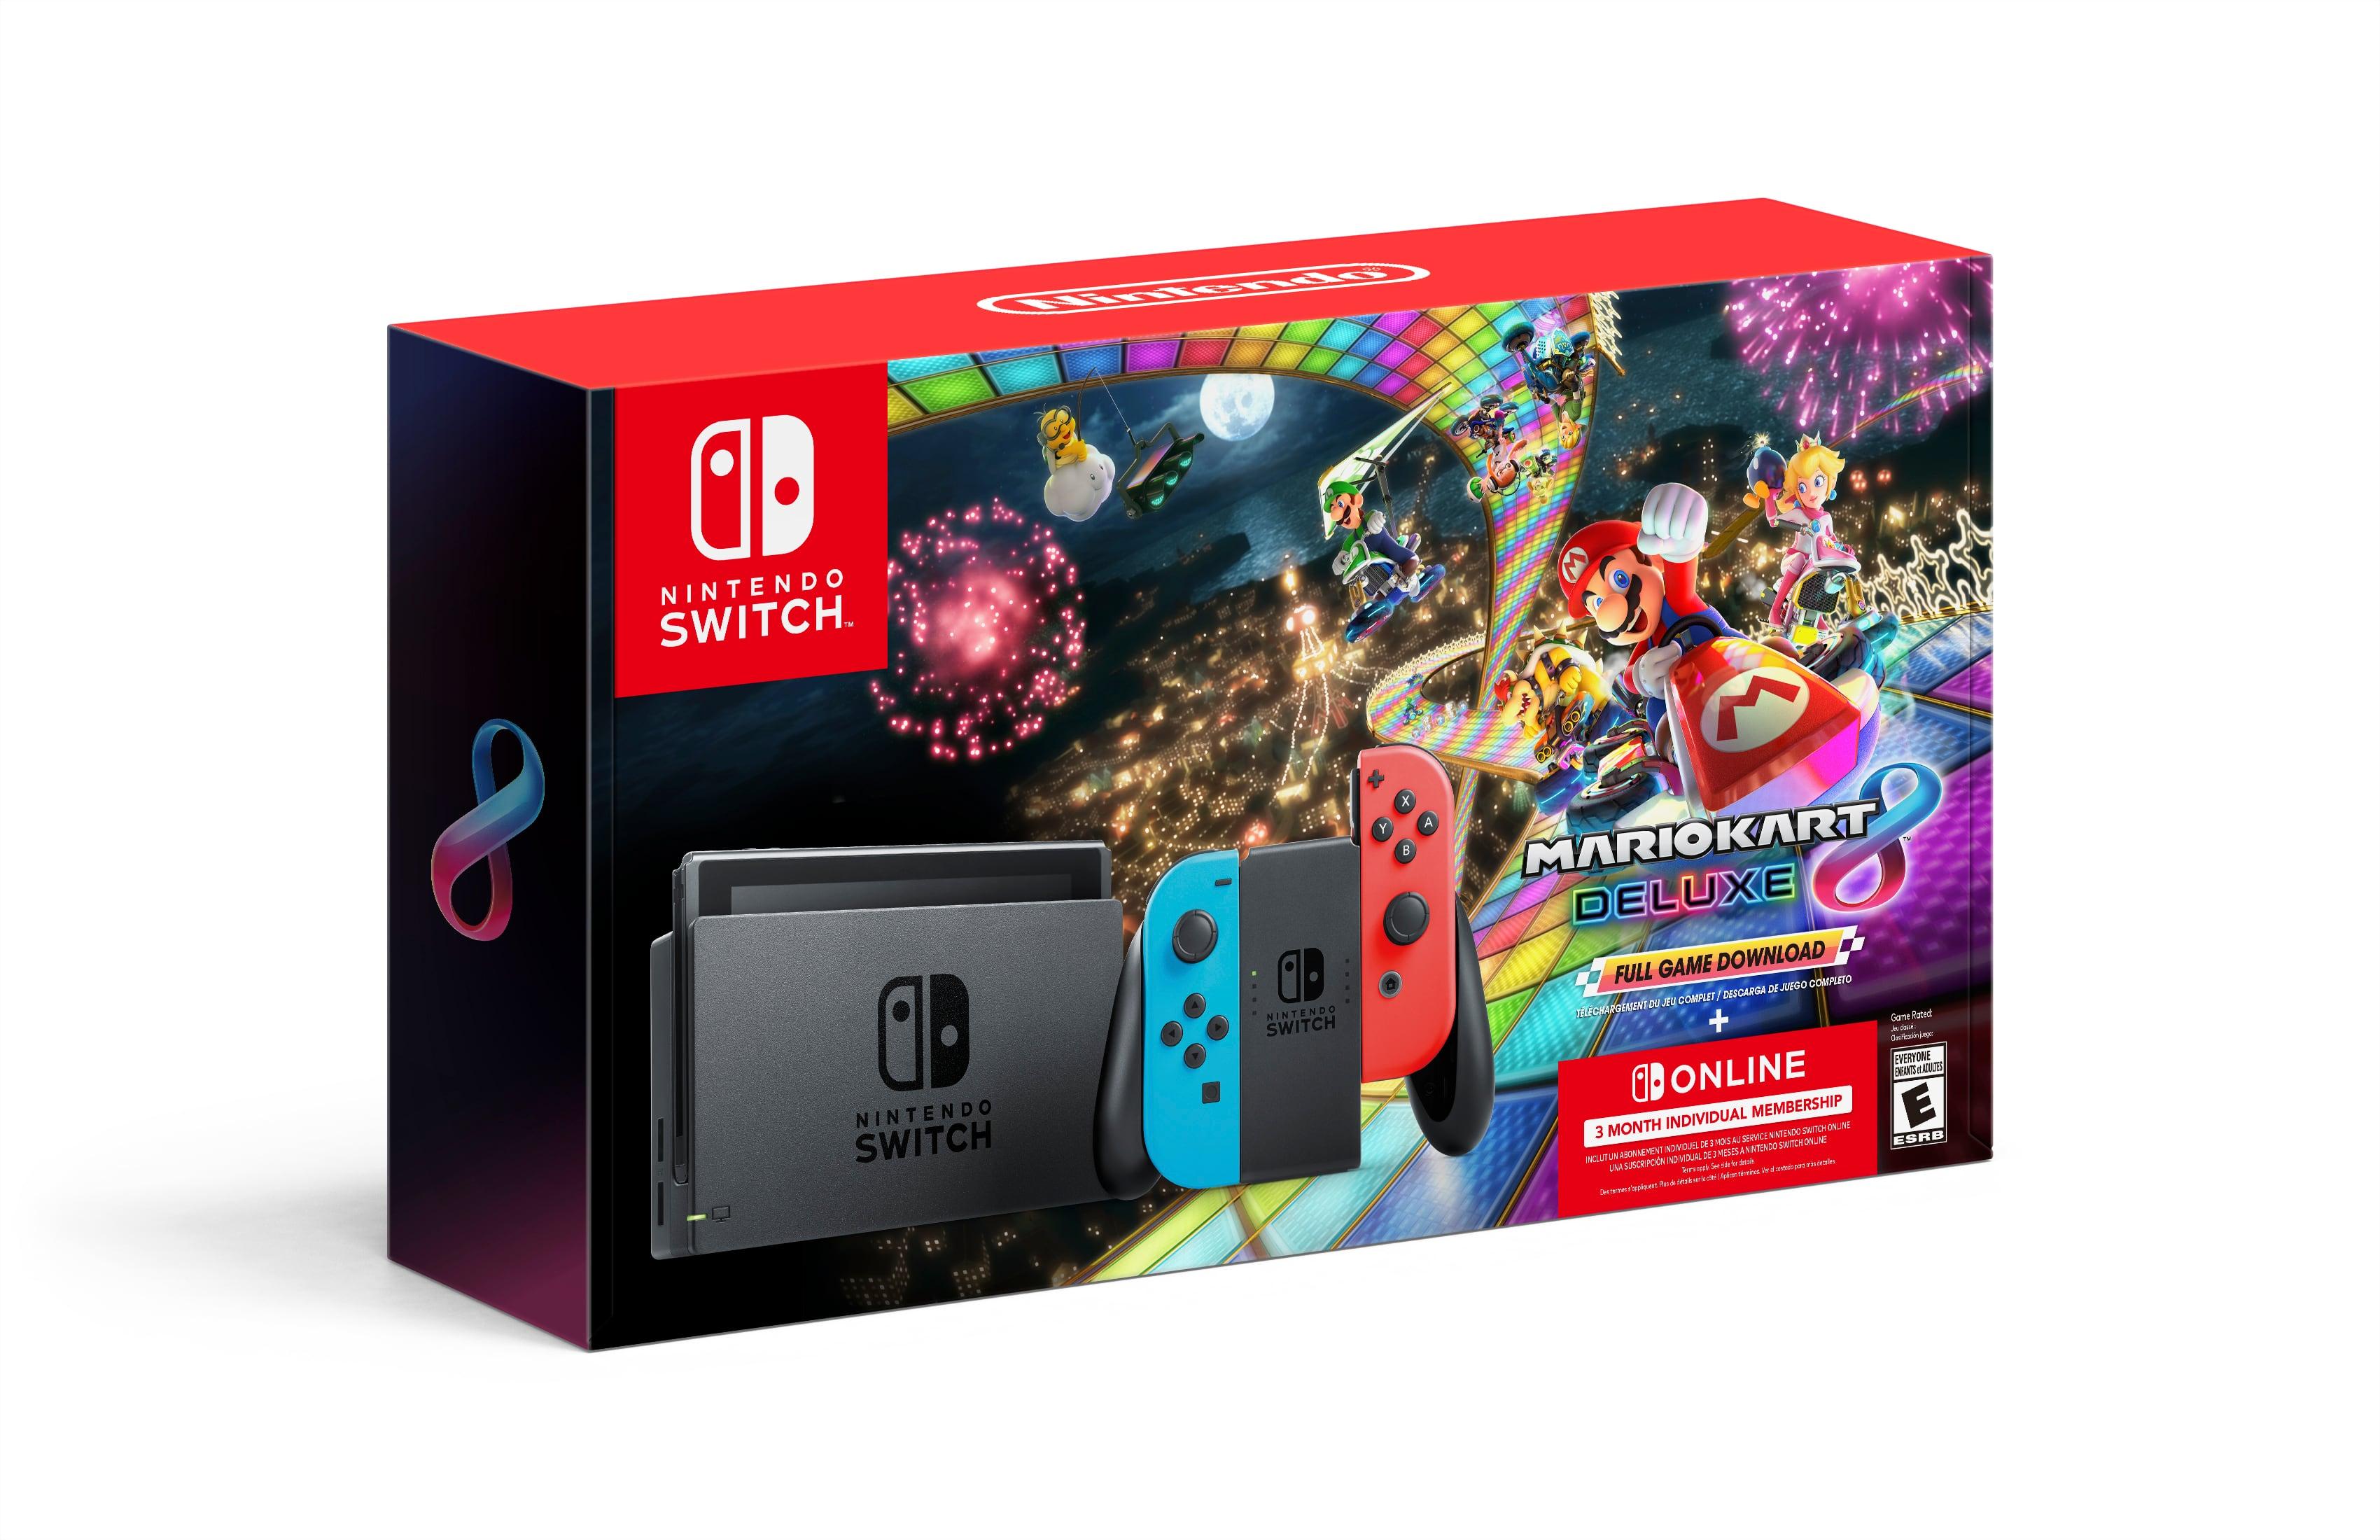 Nintendo Switch Console + Mario Kart 8 Deluxe (Digital) + 3-Mo. Nintendo Online